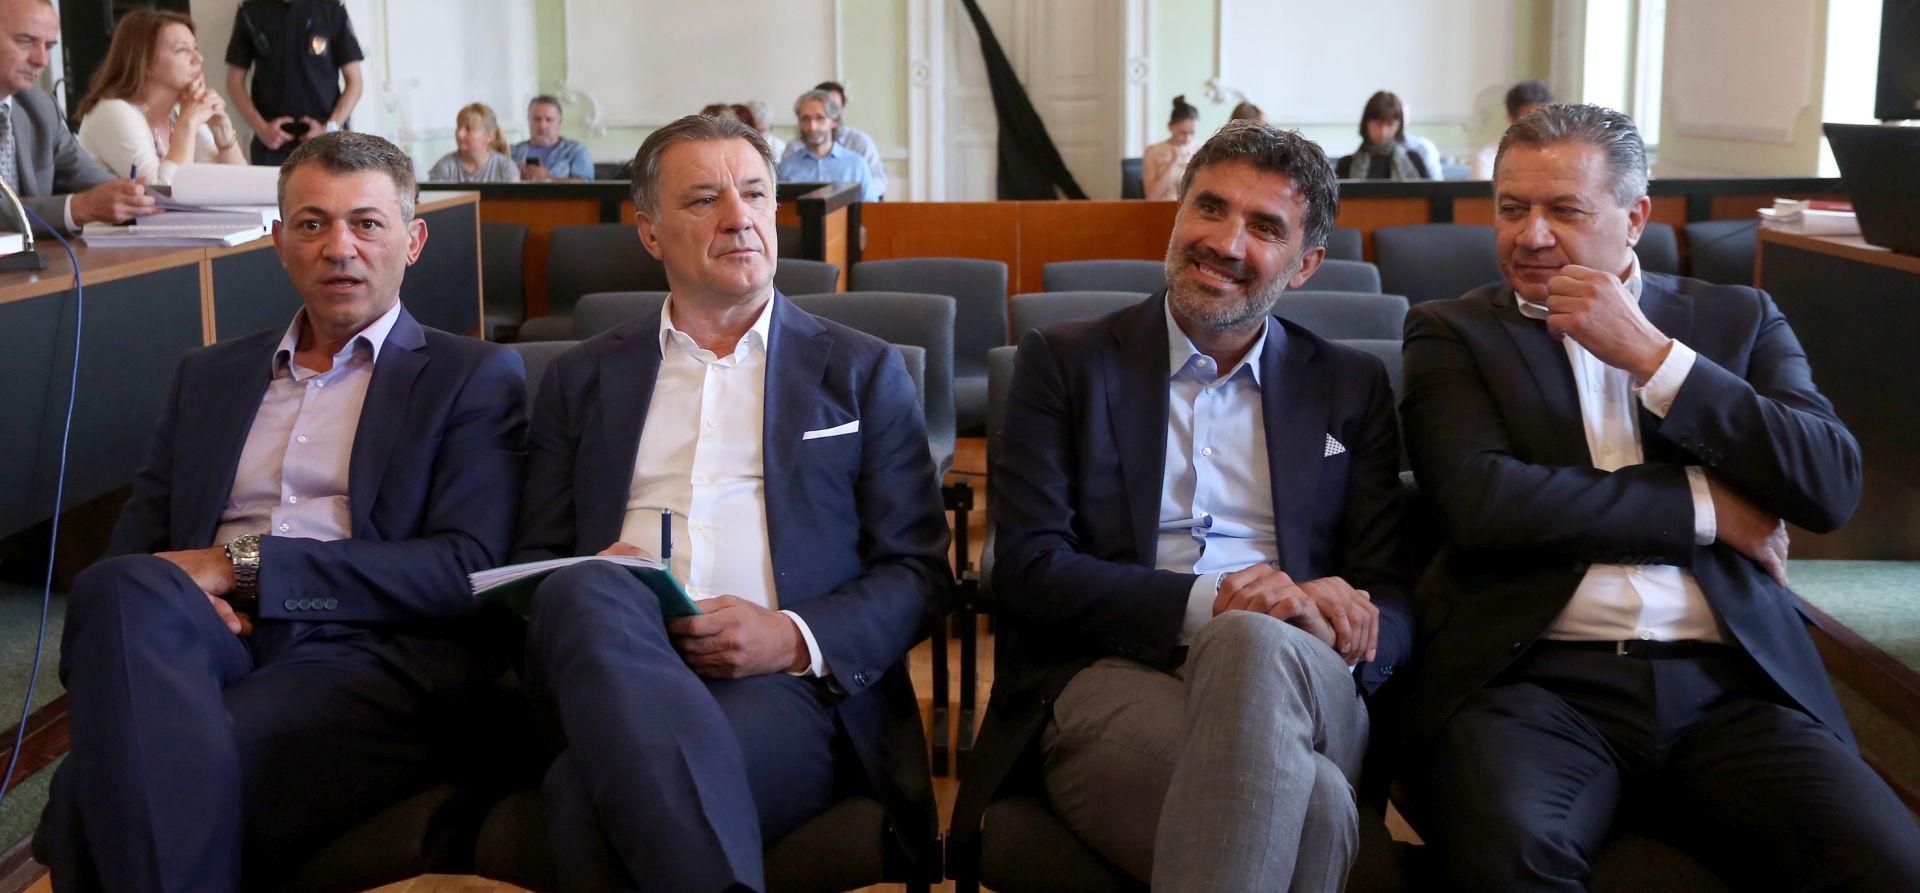 'Zoran Mamić vratio je pozajmice Dinamu prije izdavanja poreznog rješenja'